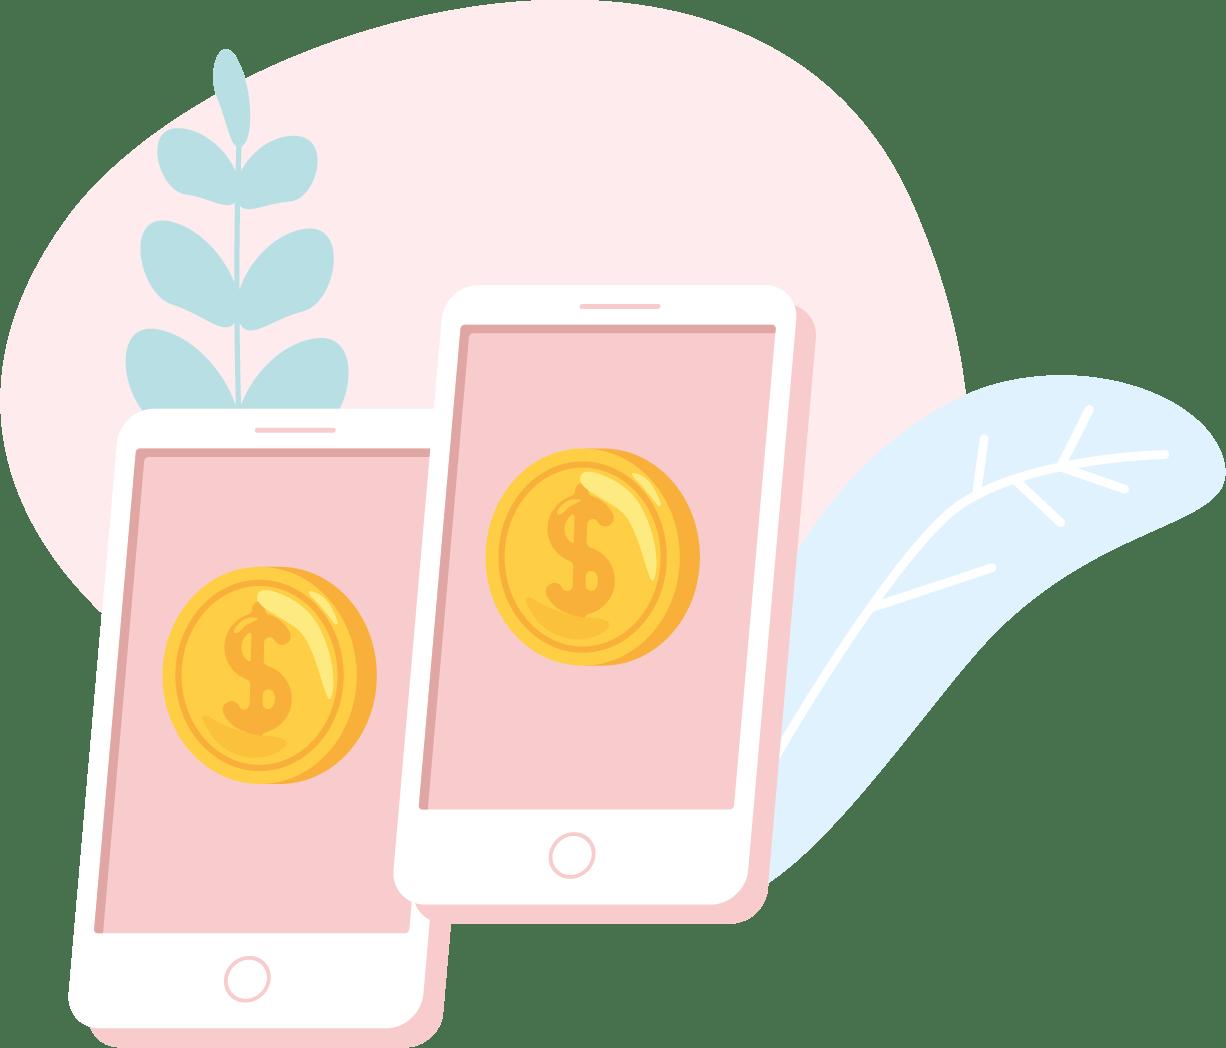 paiement-abonnement-garde